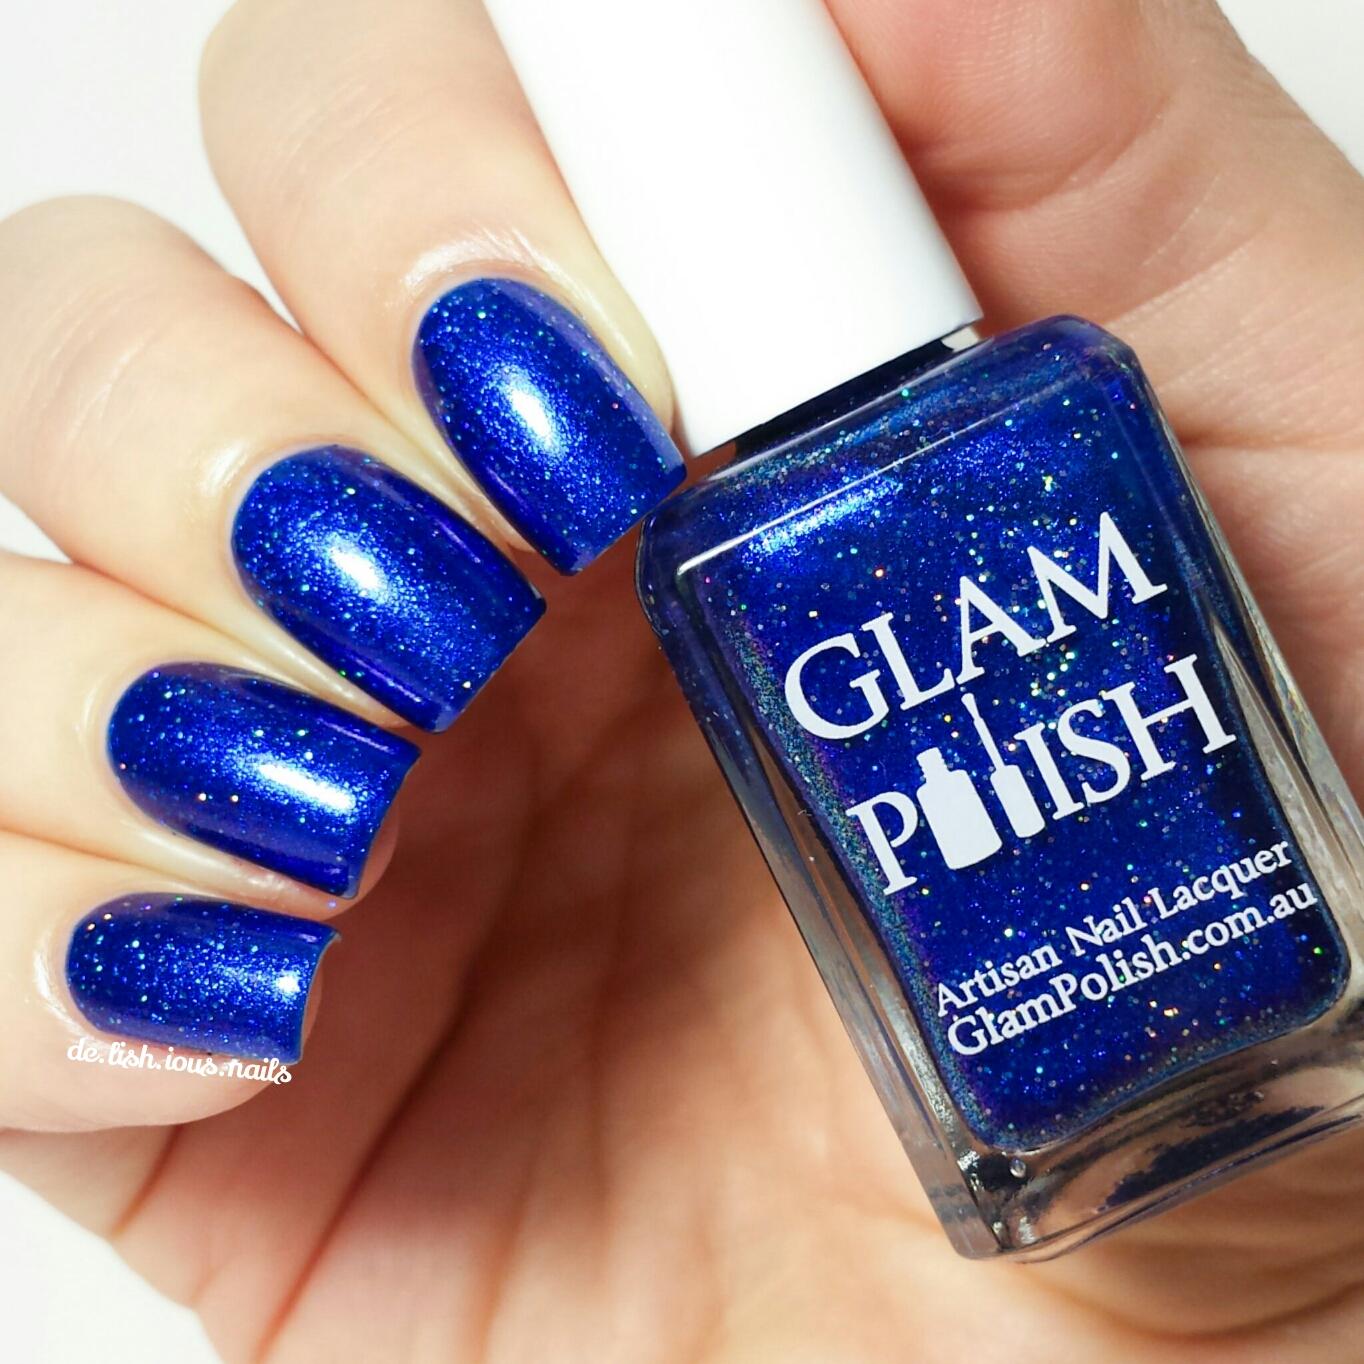 glam-polish-i-dont-do-fashion-i-am-fashion-1.jpg.jpeg